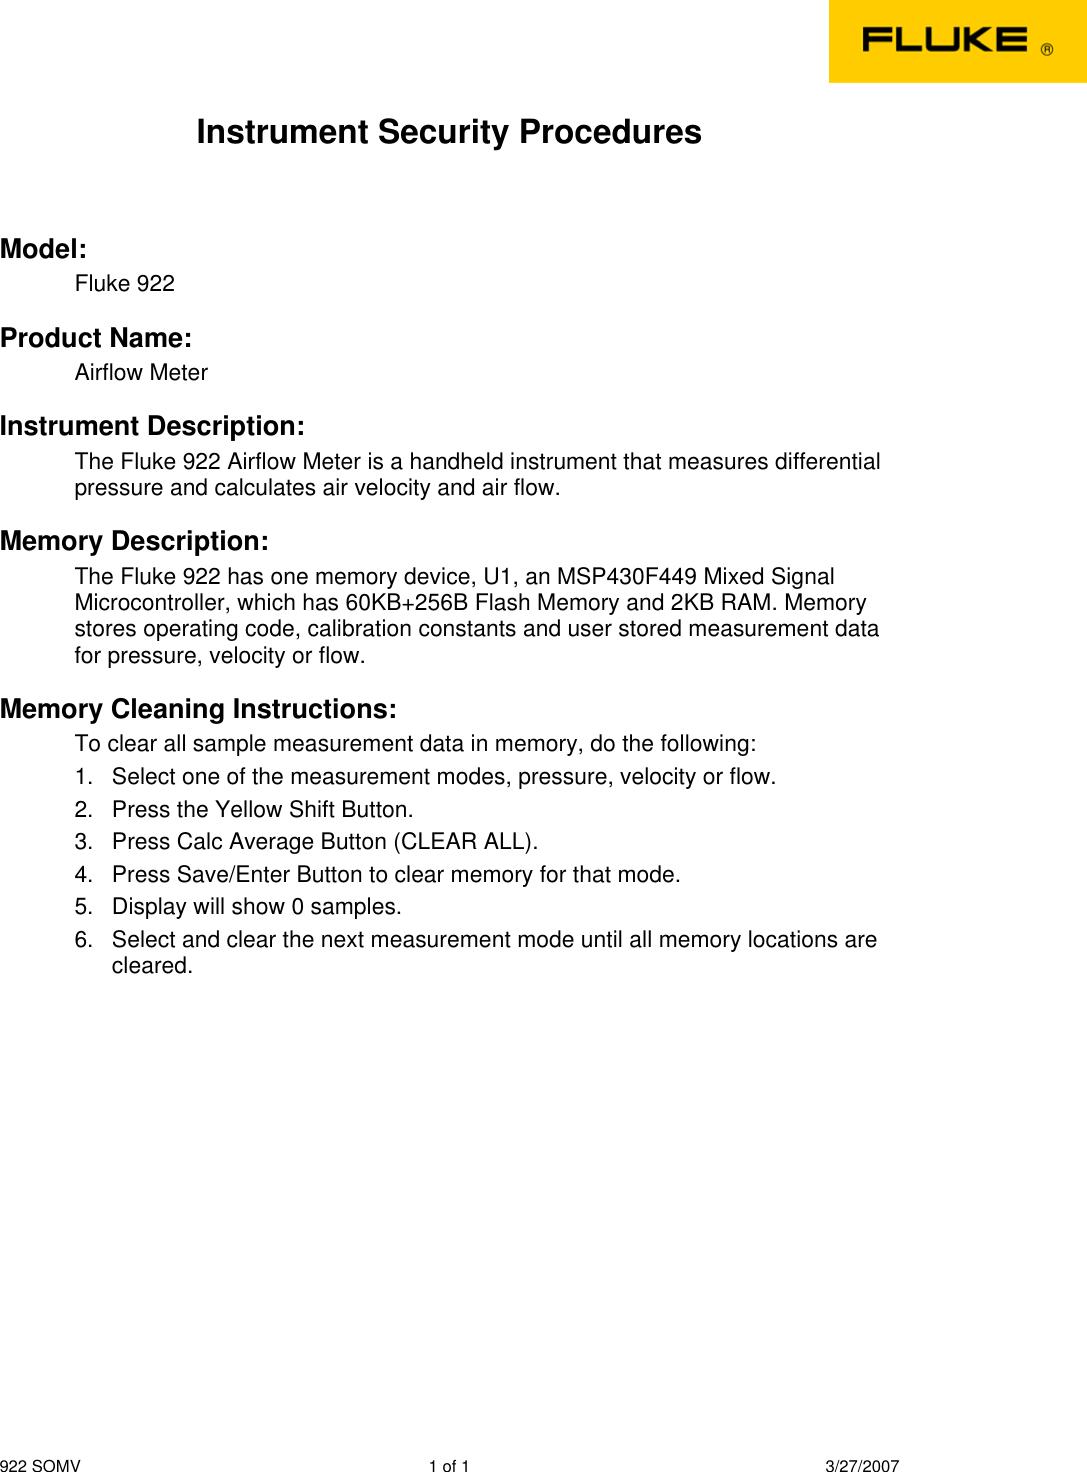 Fluke 922 Airflow Users Manual